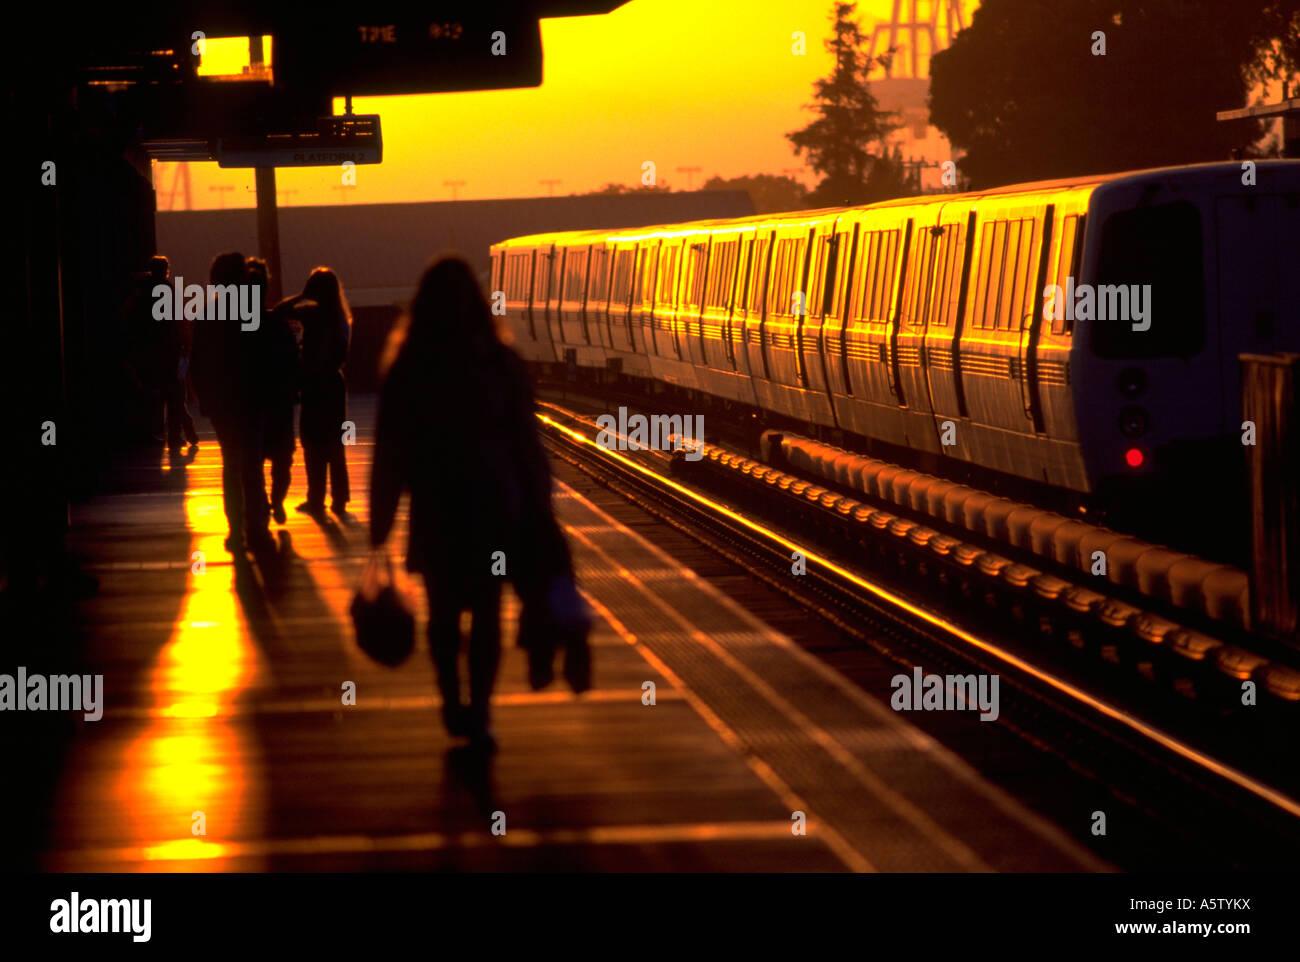 Painet hl1597 bart station sunset arriving passengers awaiting bay area rapid transit oakland ca train transportation - Stock Image